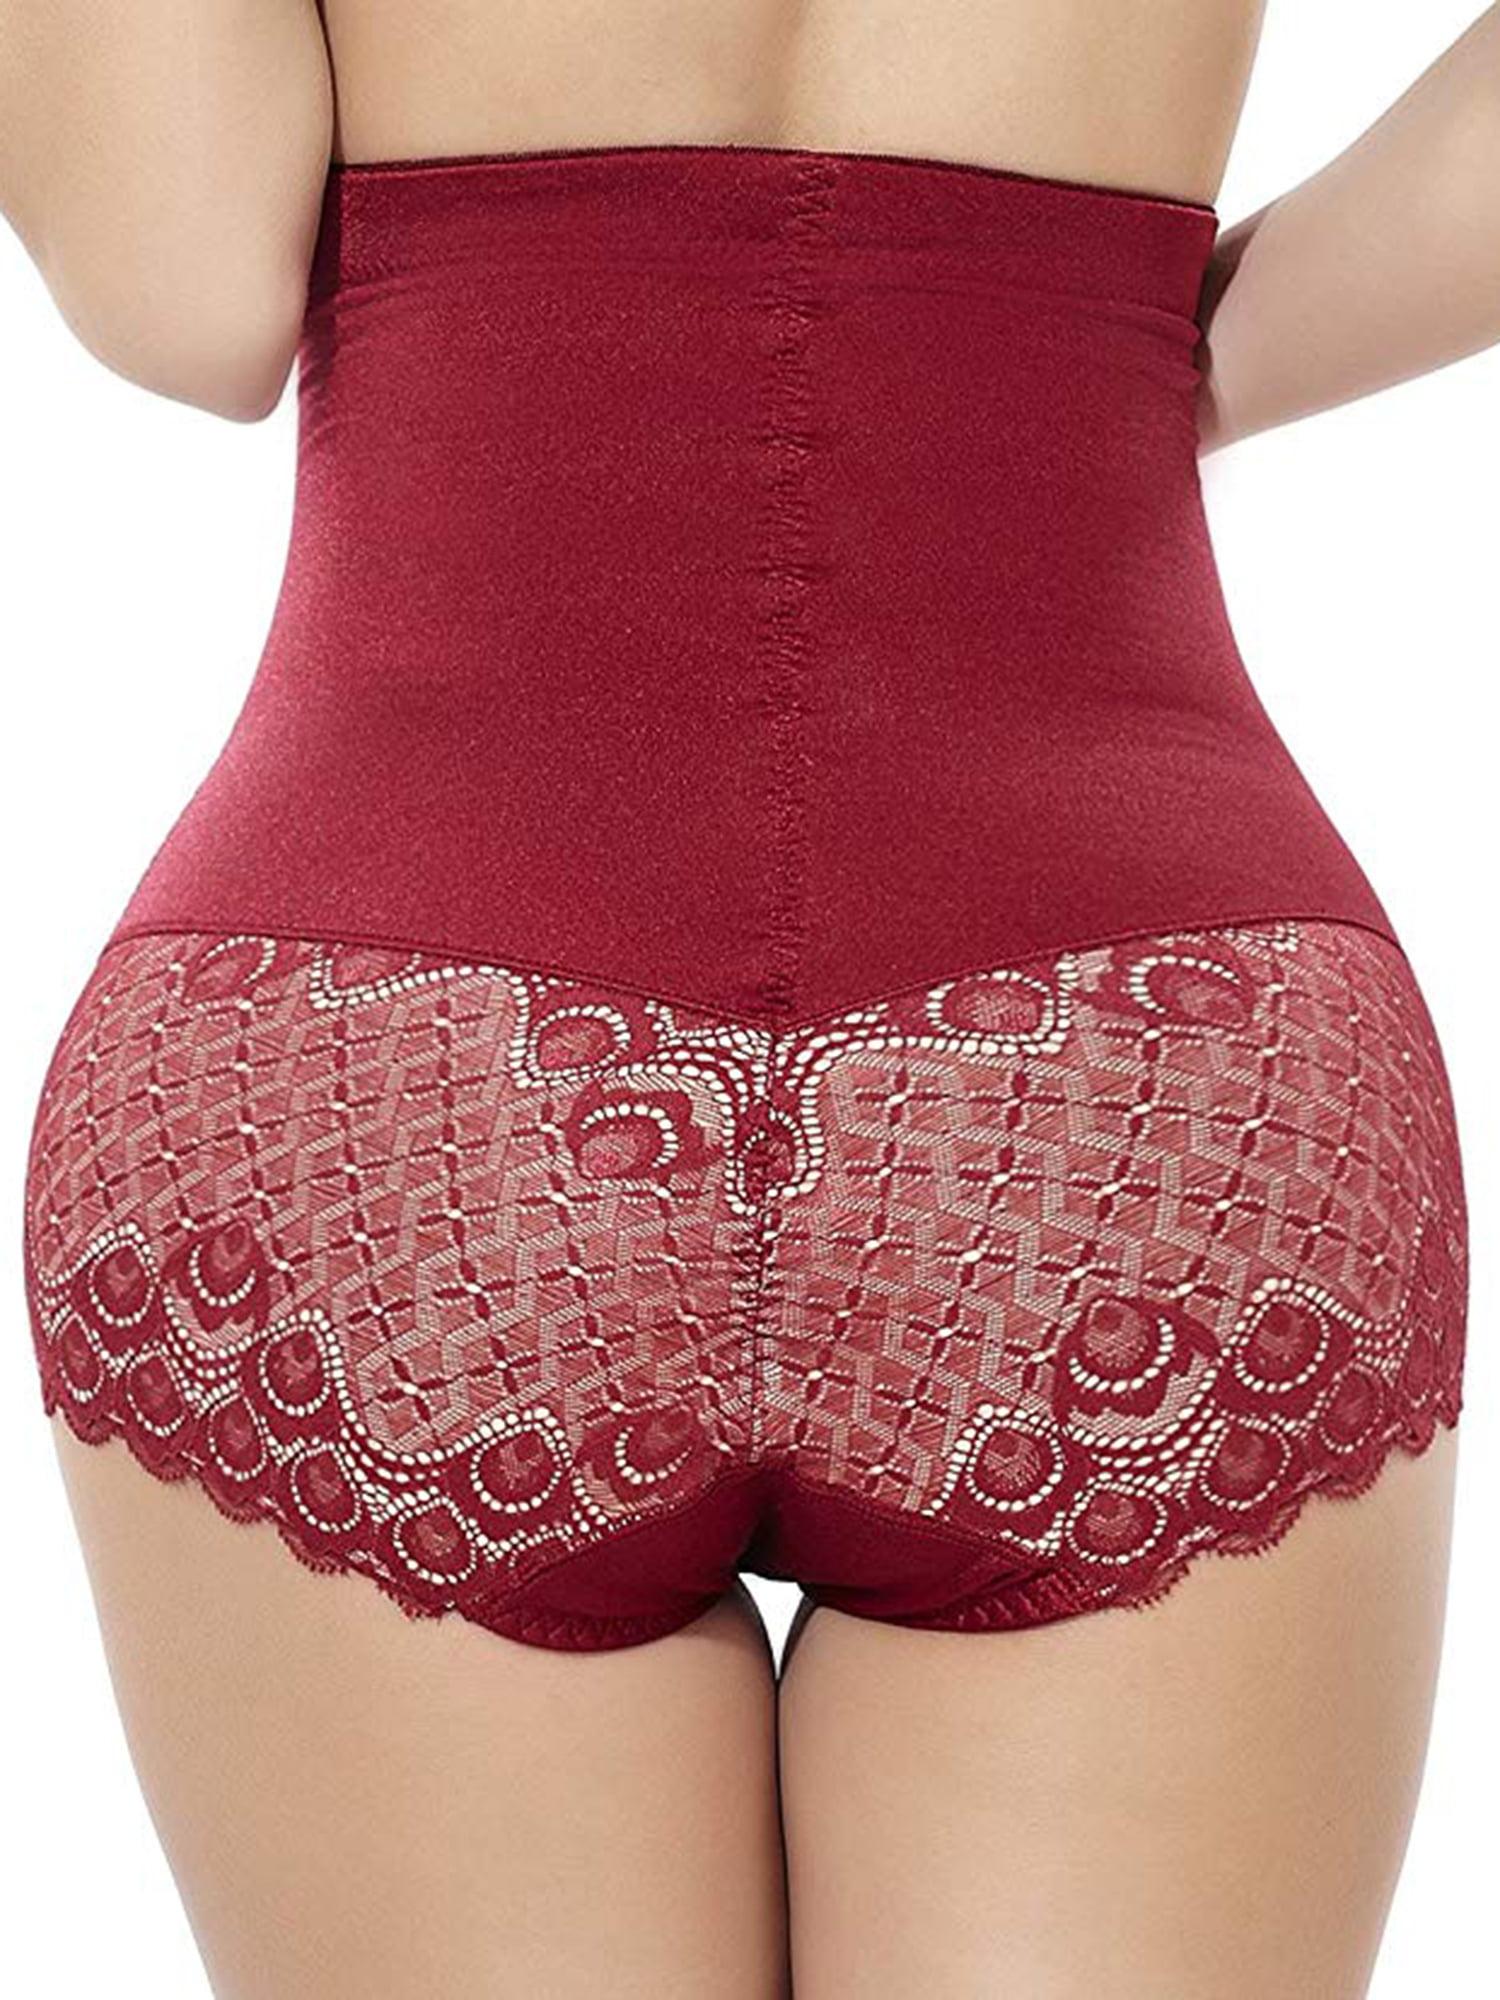 New Diamante Womens Tummy Control Shapewear Padded Swimsuit Chocolate Brown